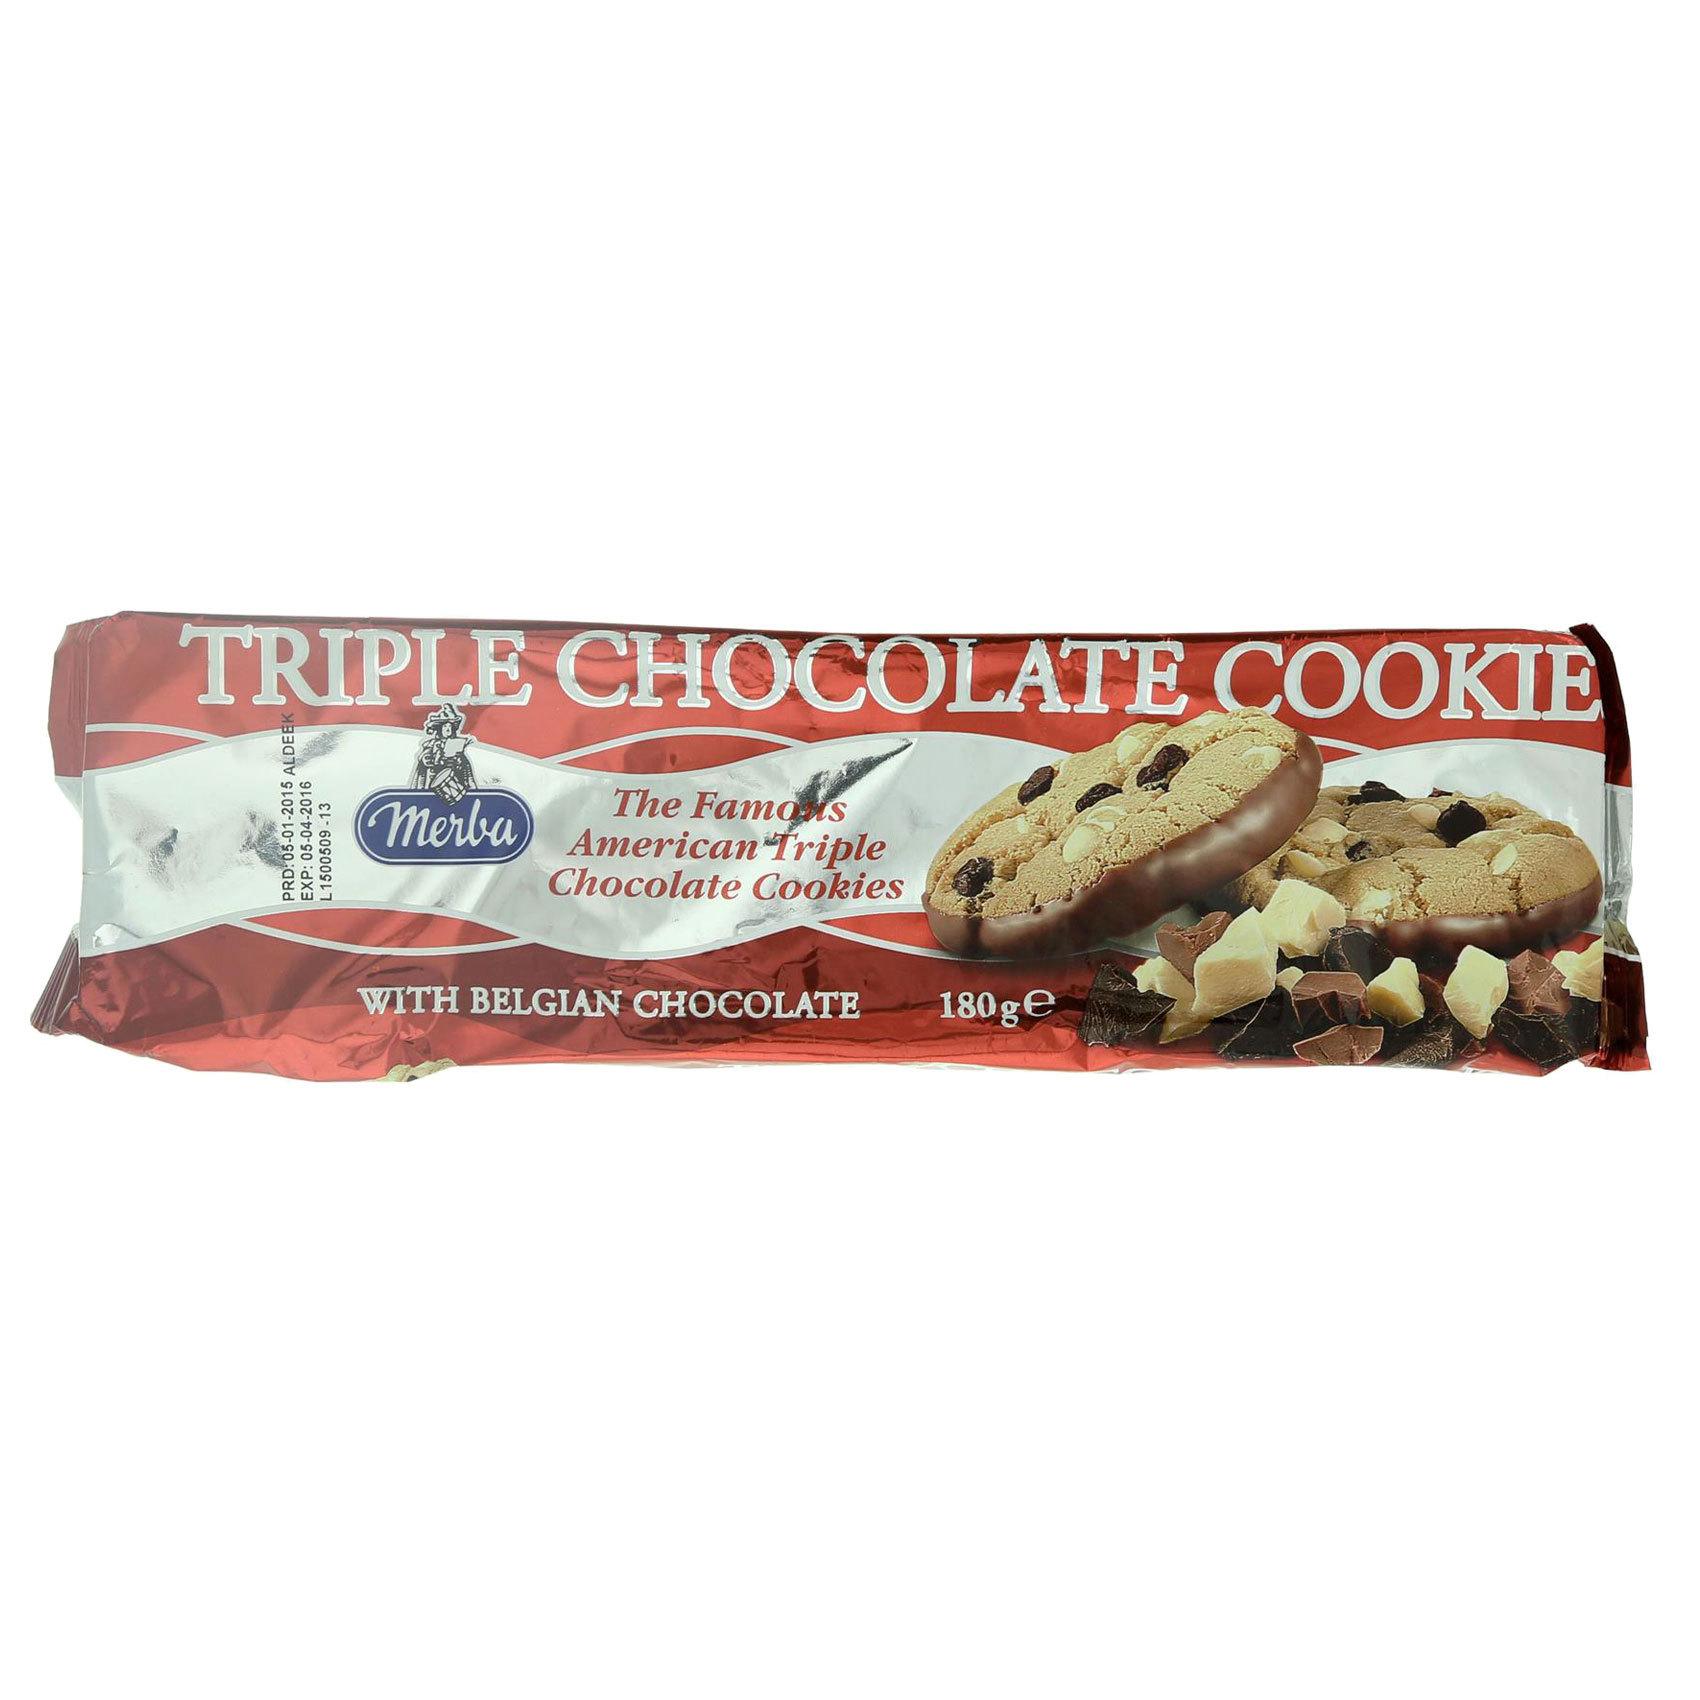 MERBA TRIPLE CHOCOLATECOOKIES 180G